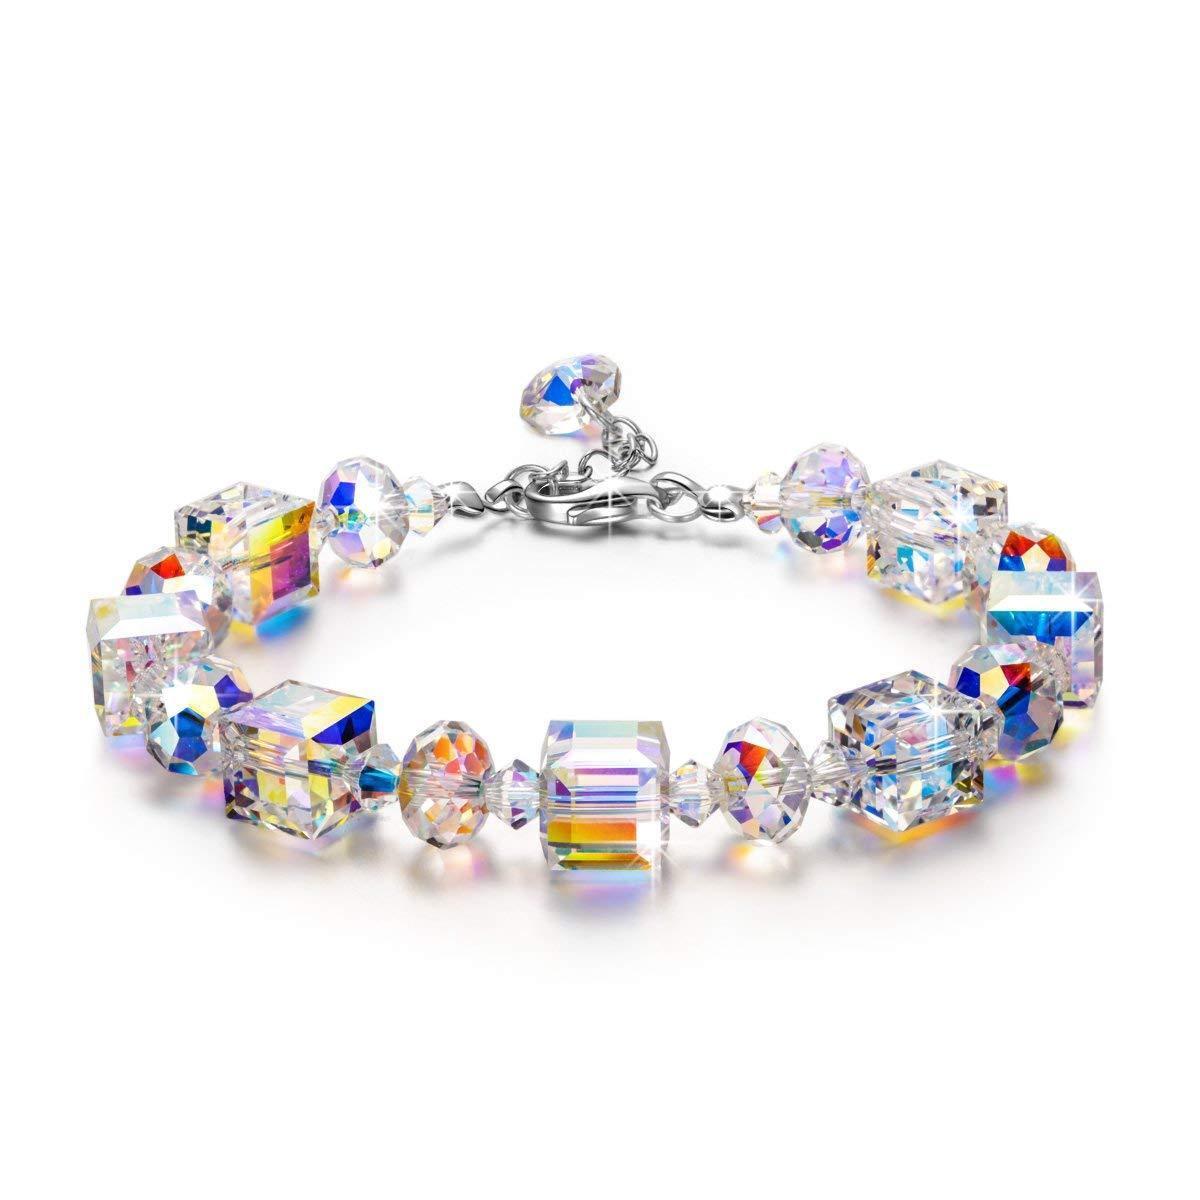 Swarovski Crystal Elements 8mm Bracelet Pacific Opal, Clear Grey, Clear Stones N